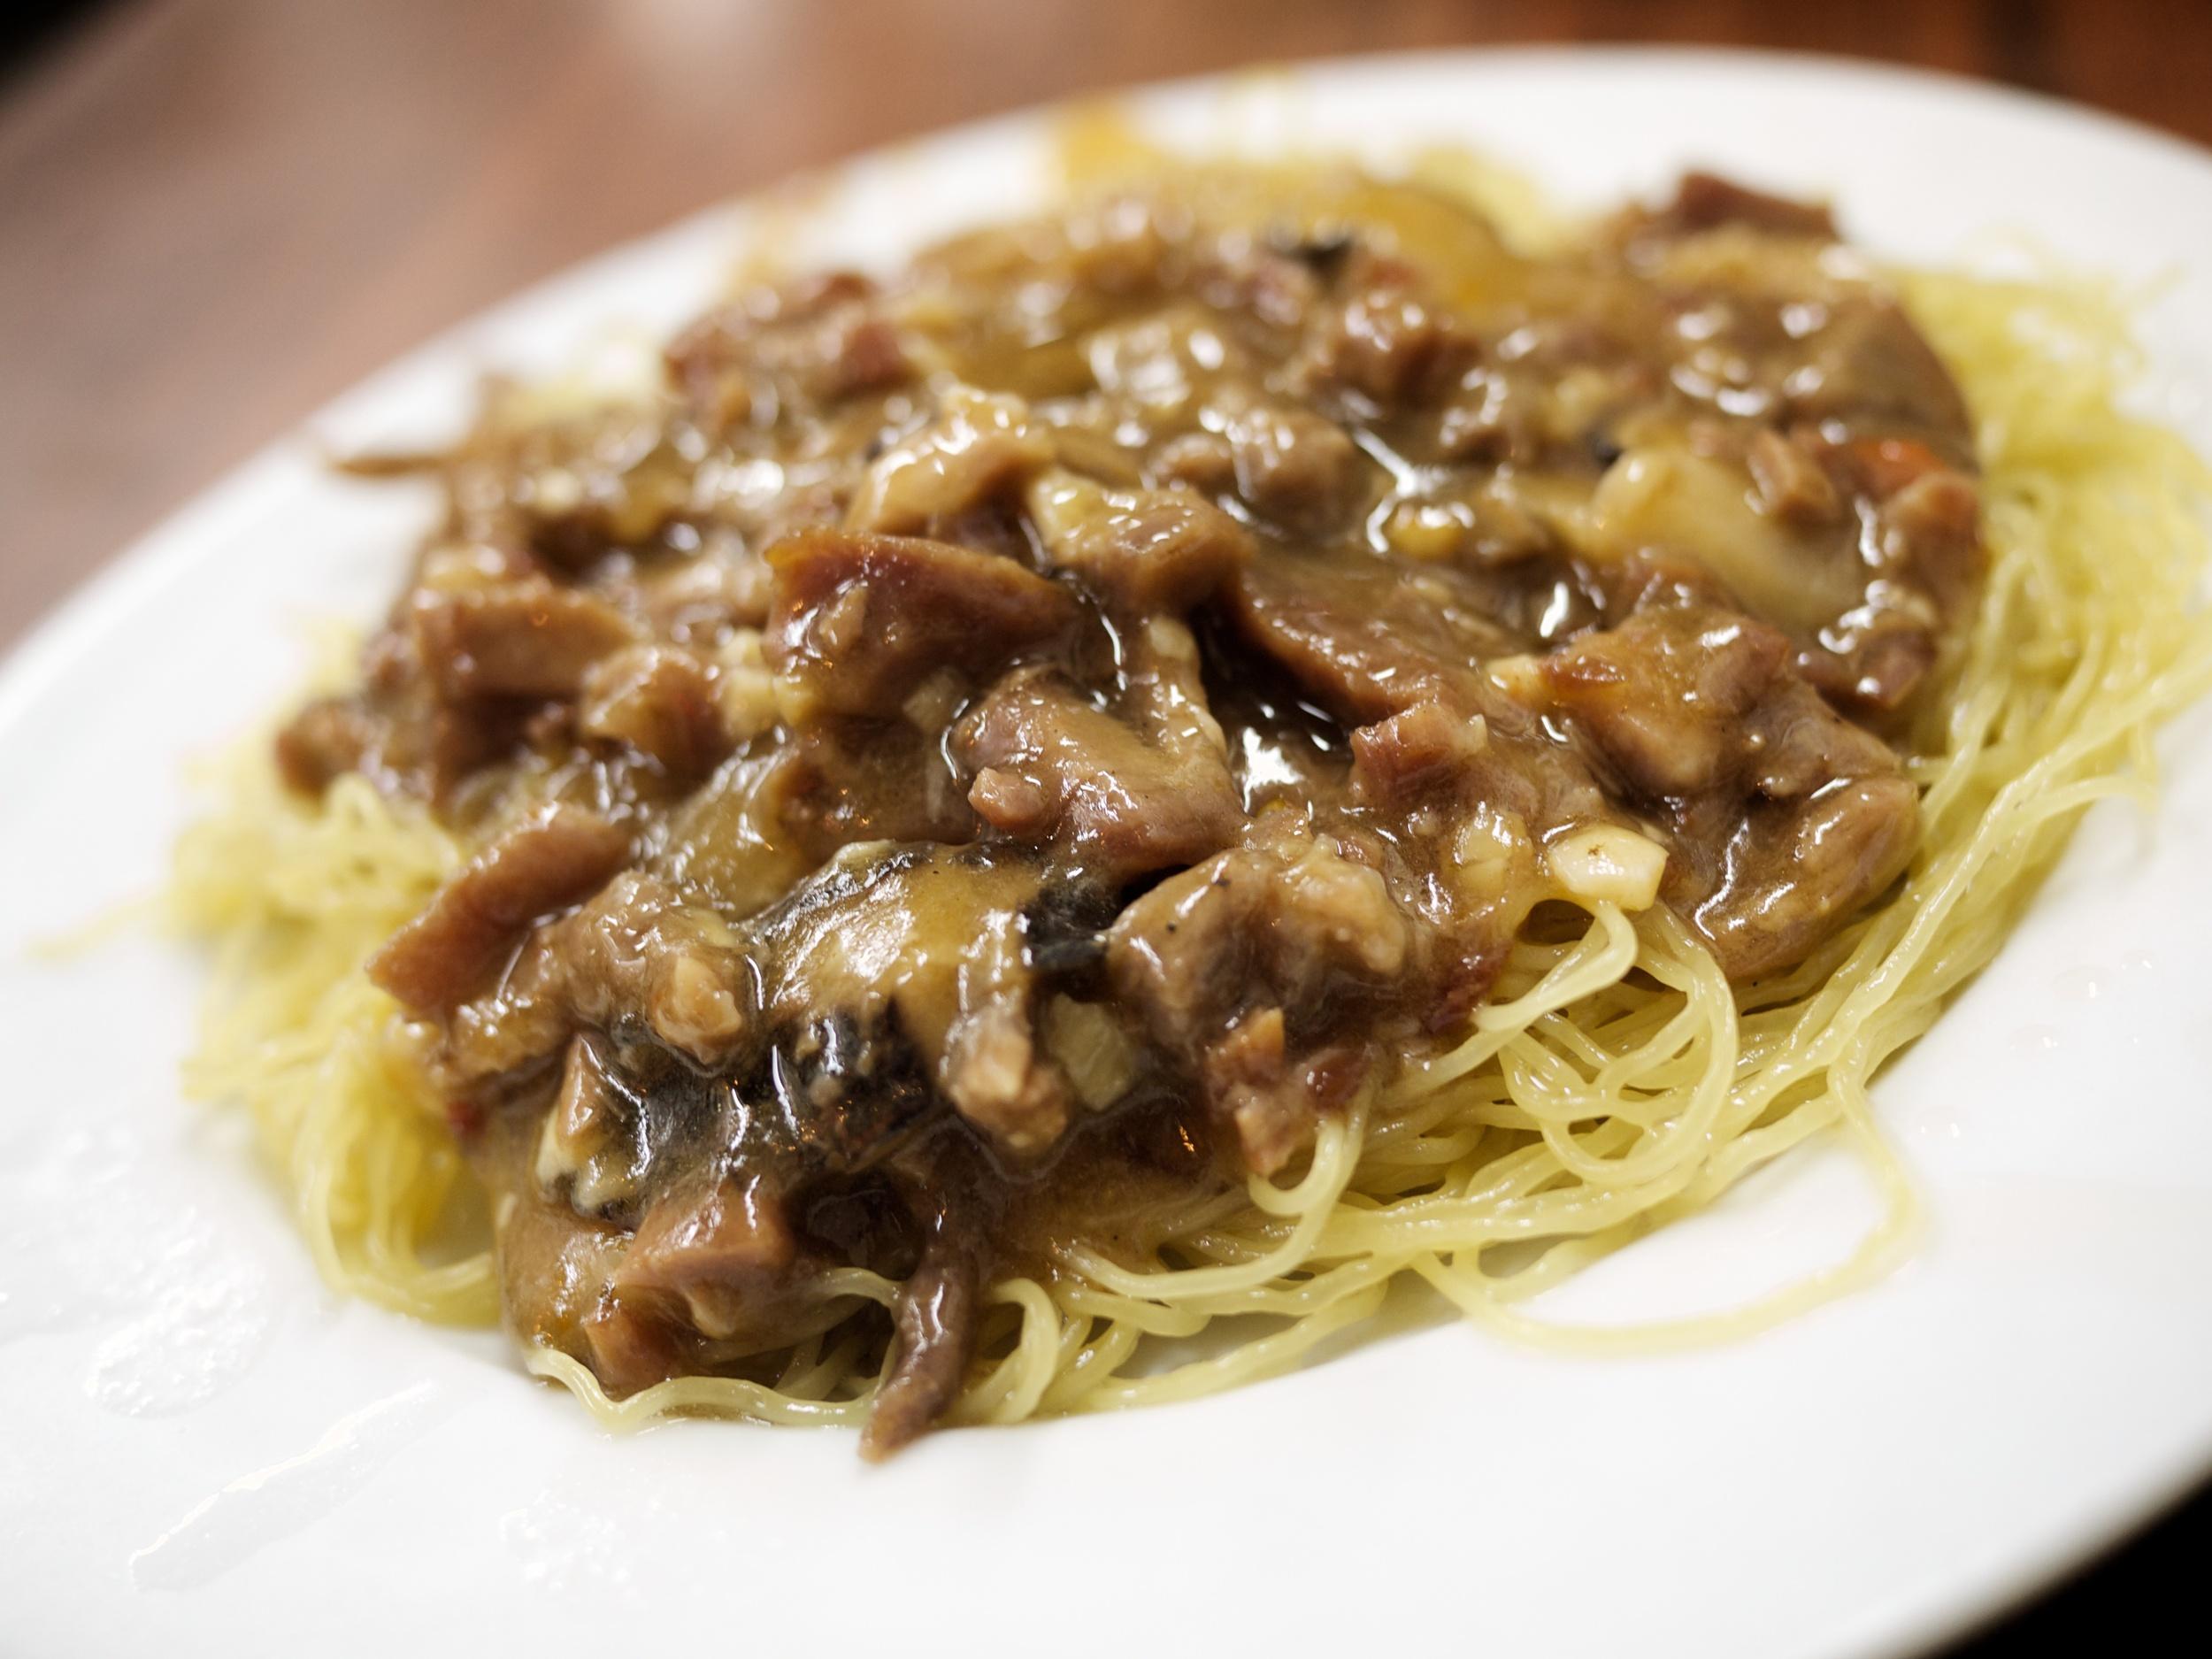 FOOD-Noodles_2011-09-08_19-41-20_P1040508_©JosephLinaschke2011.jpg